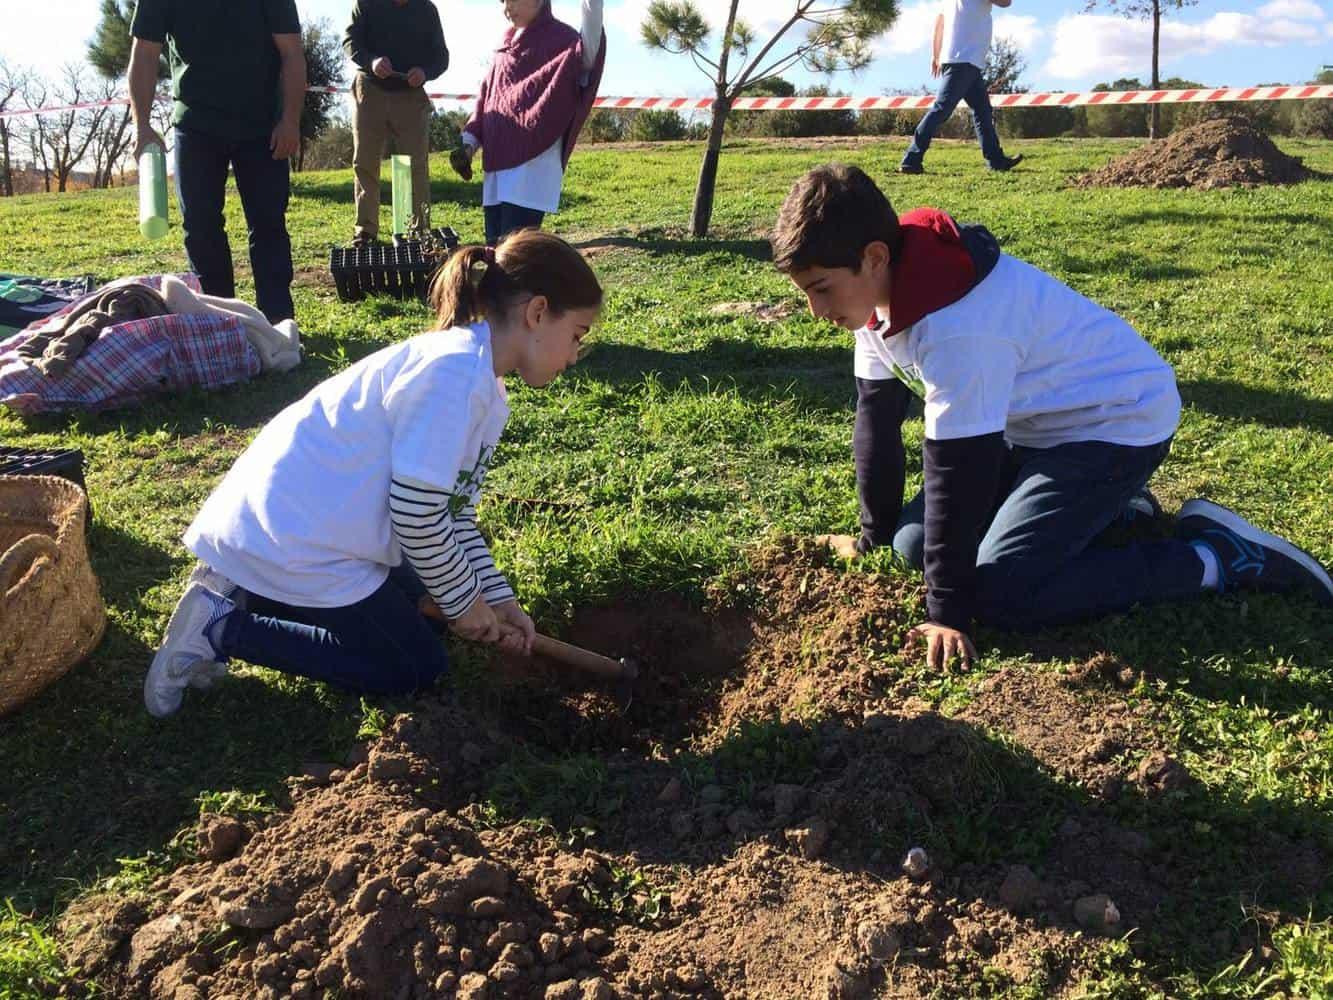 Kids planting a tree | Giraffa